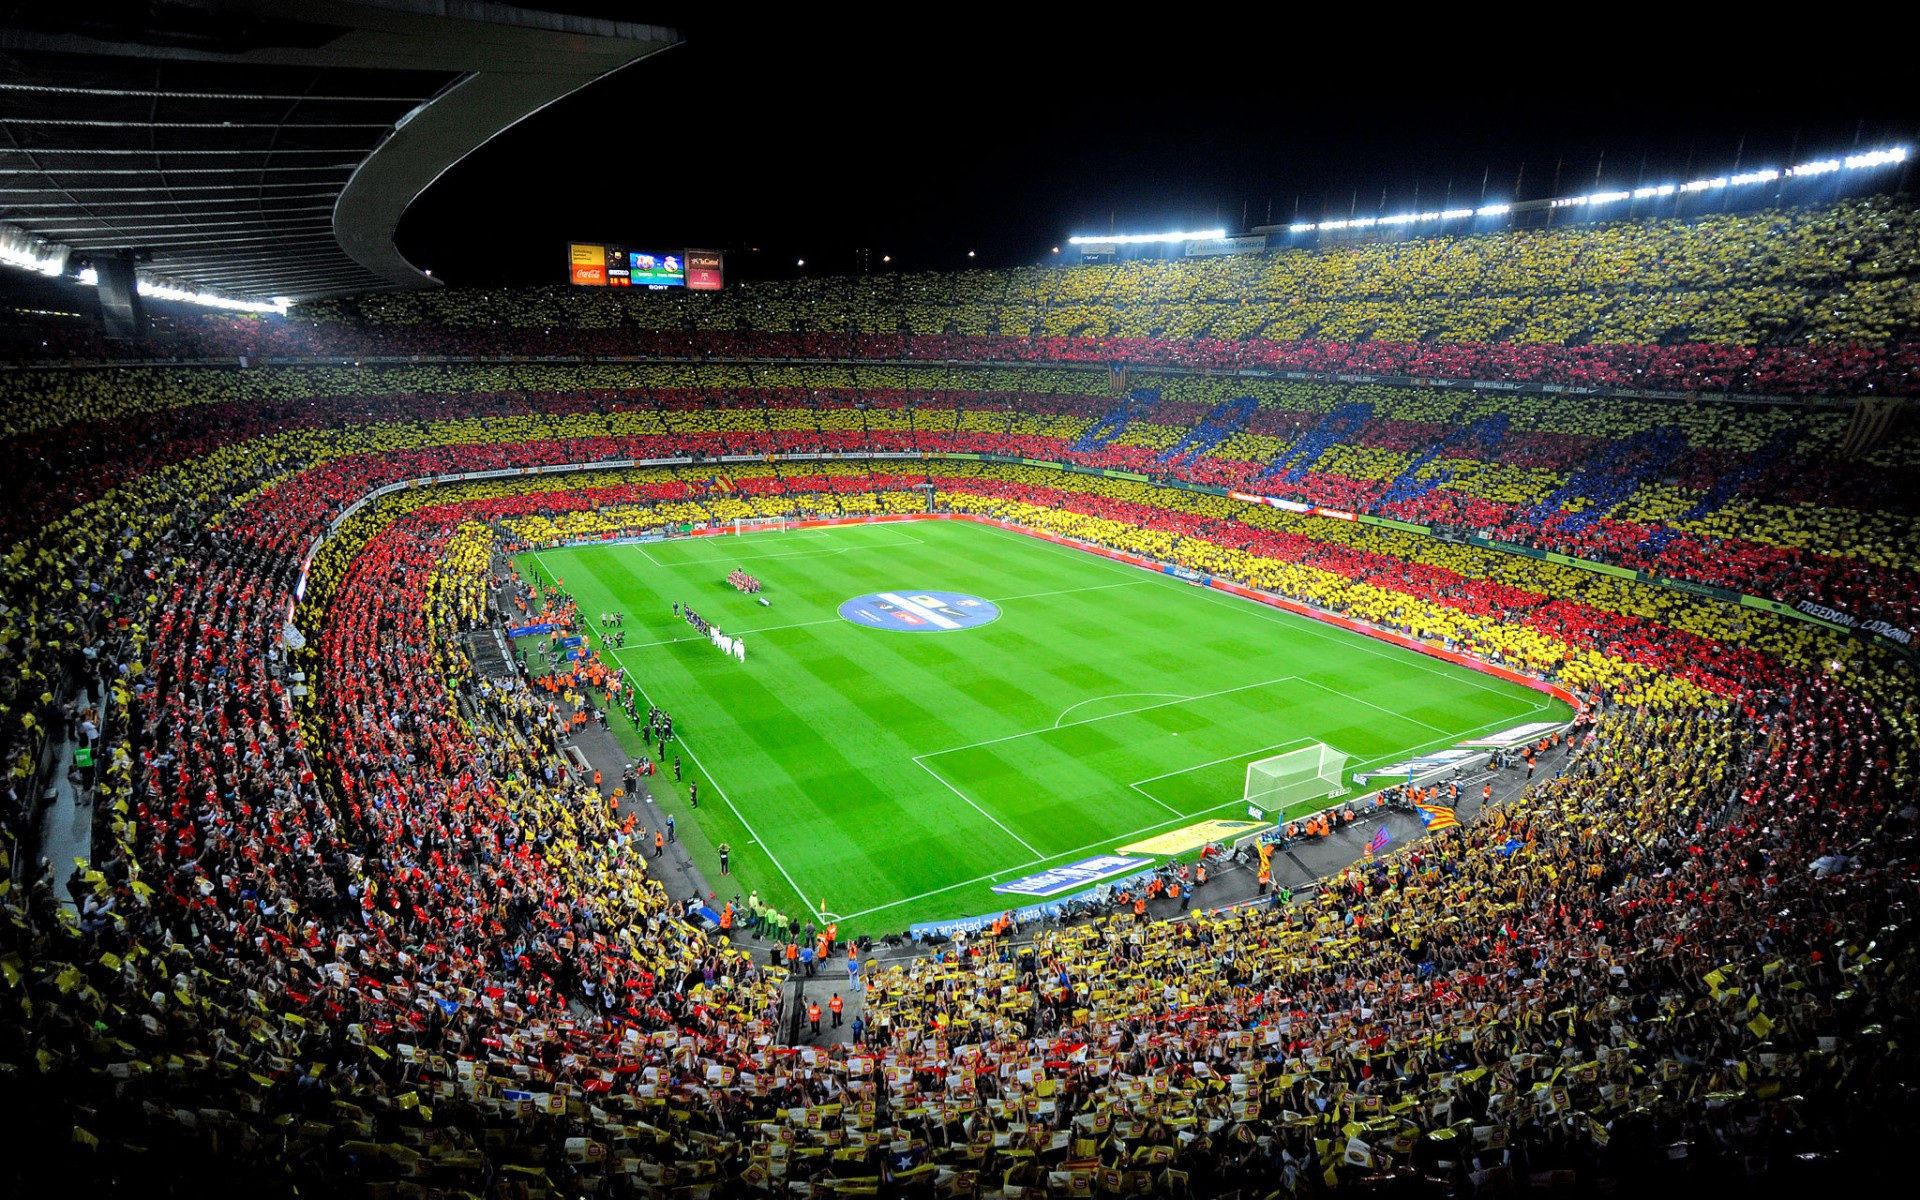 Футбол. Анонс футбольного матча 1/8 финала Лиги Чемпионов 2014 – 2015 года. «Барселона» (Испания, Барселона) - «Манчестер Сити» (Англия, Манчестер). 2-й матч.